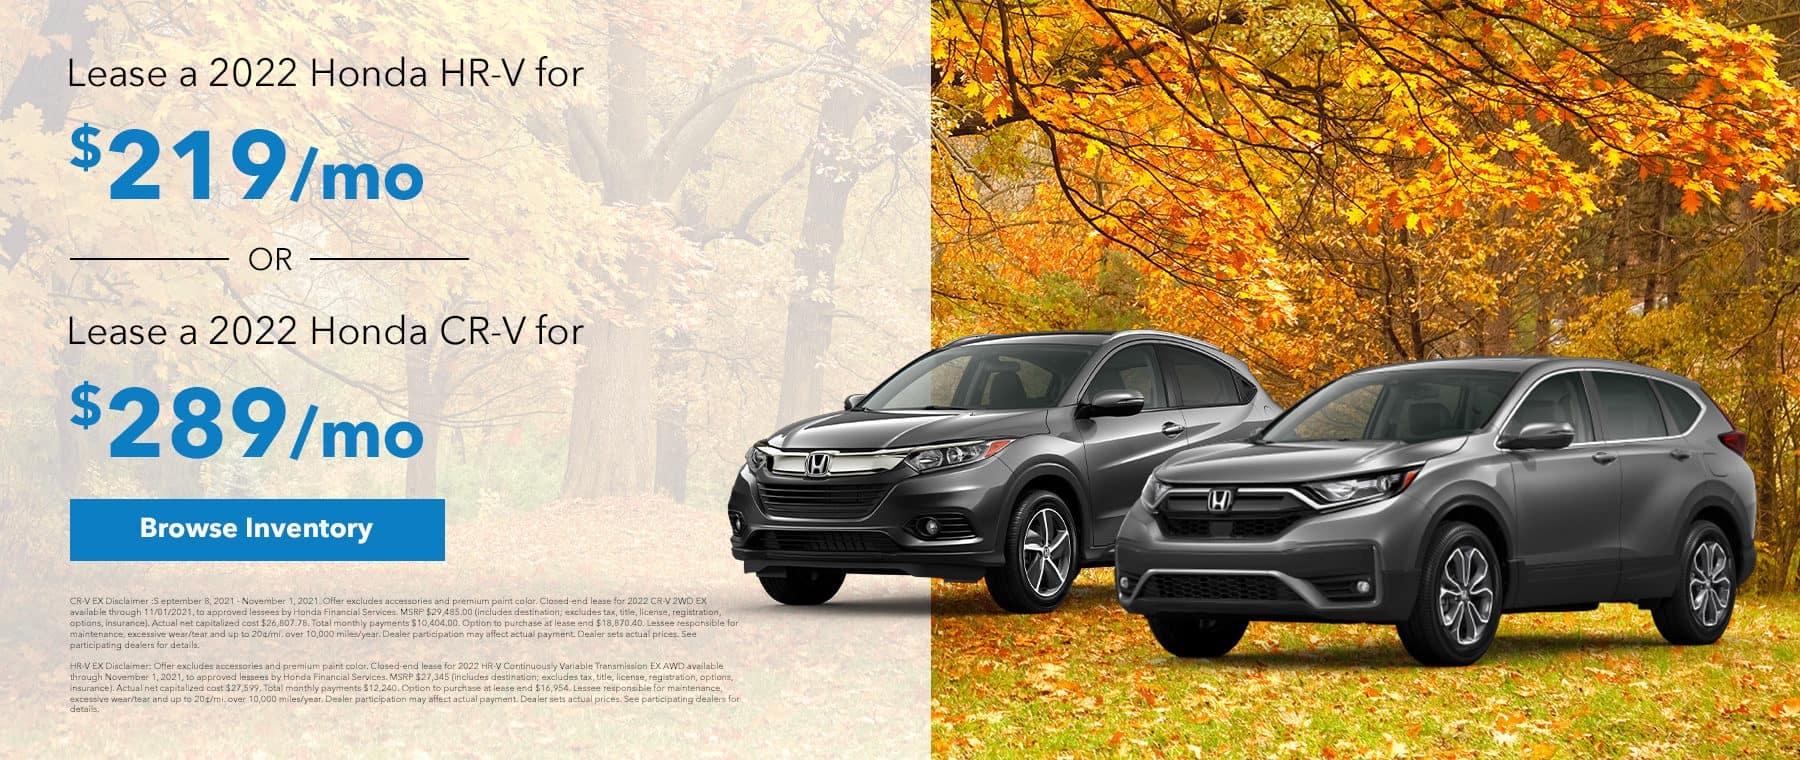 Lease a 2022 Honda HR-V for $219/mo or a 2022 Honda CR-V for $289/month